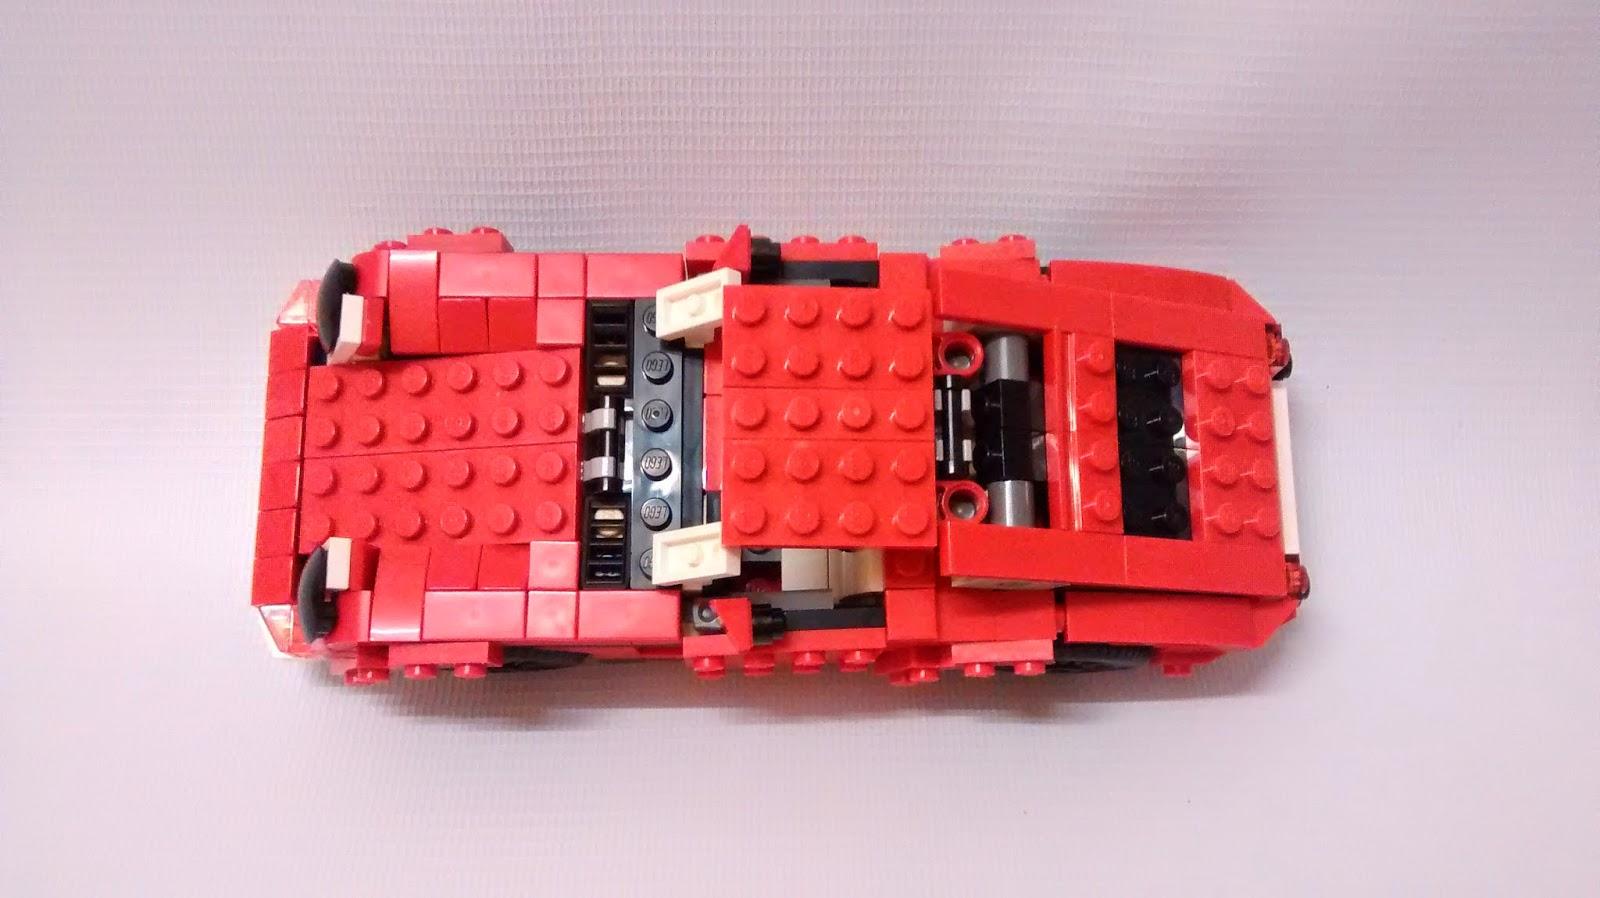 Yoshiny S Design Lego 31024 Alternate Build 80 S Porsche 911